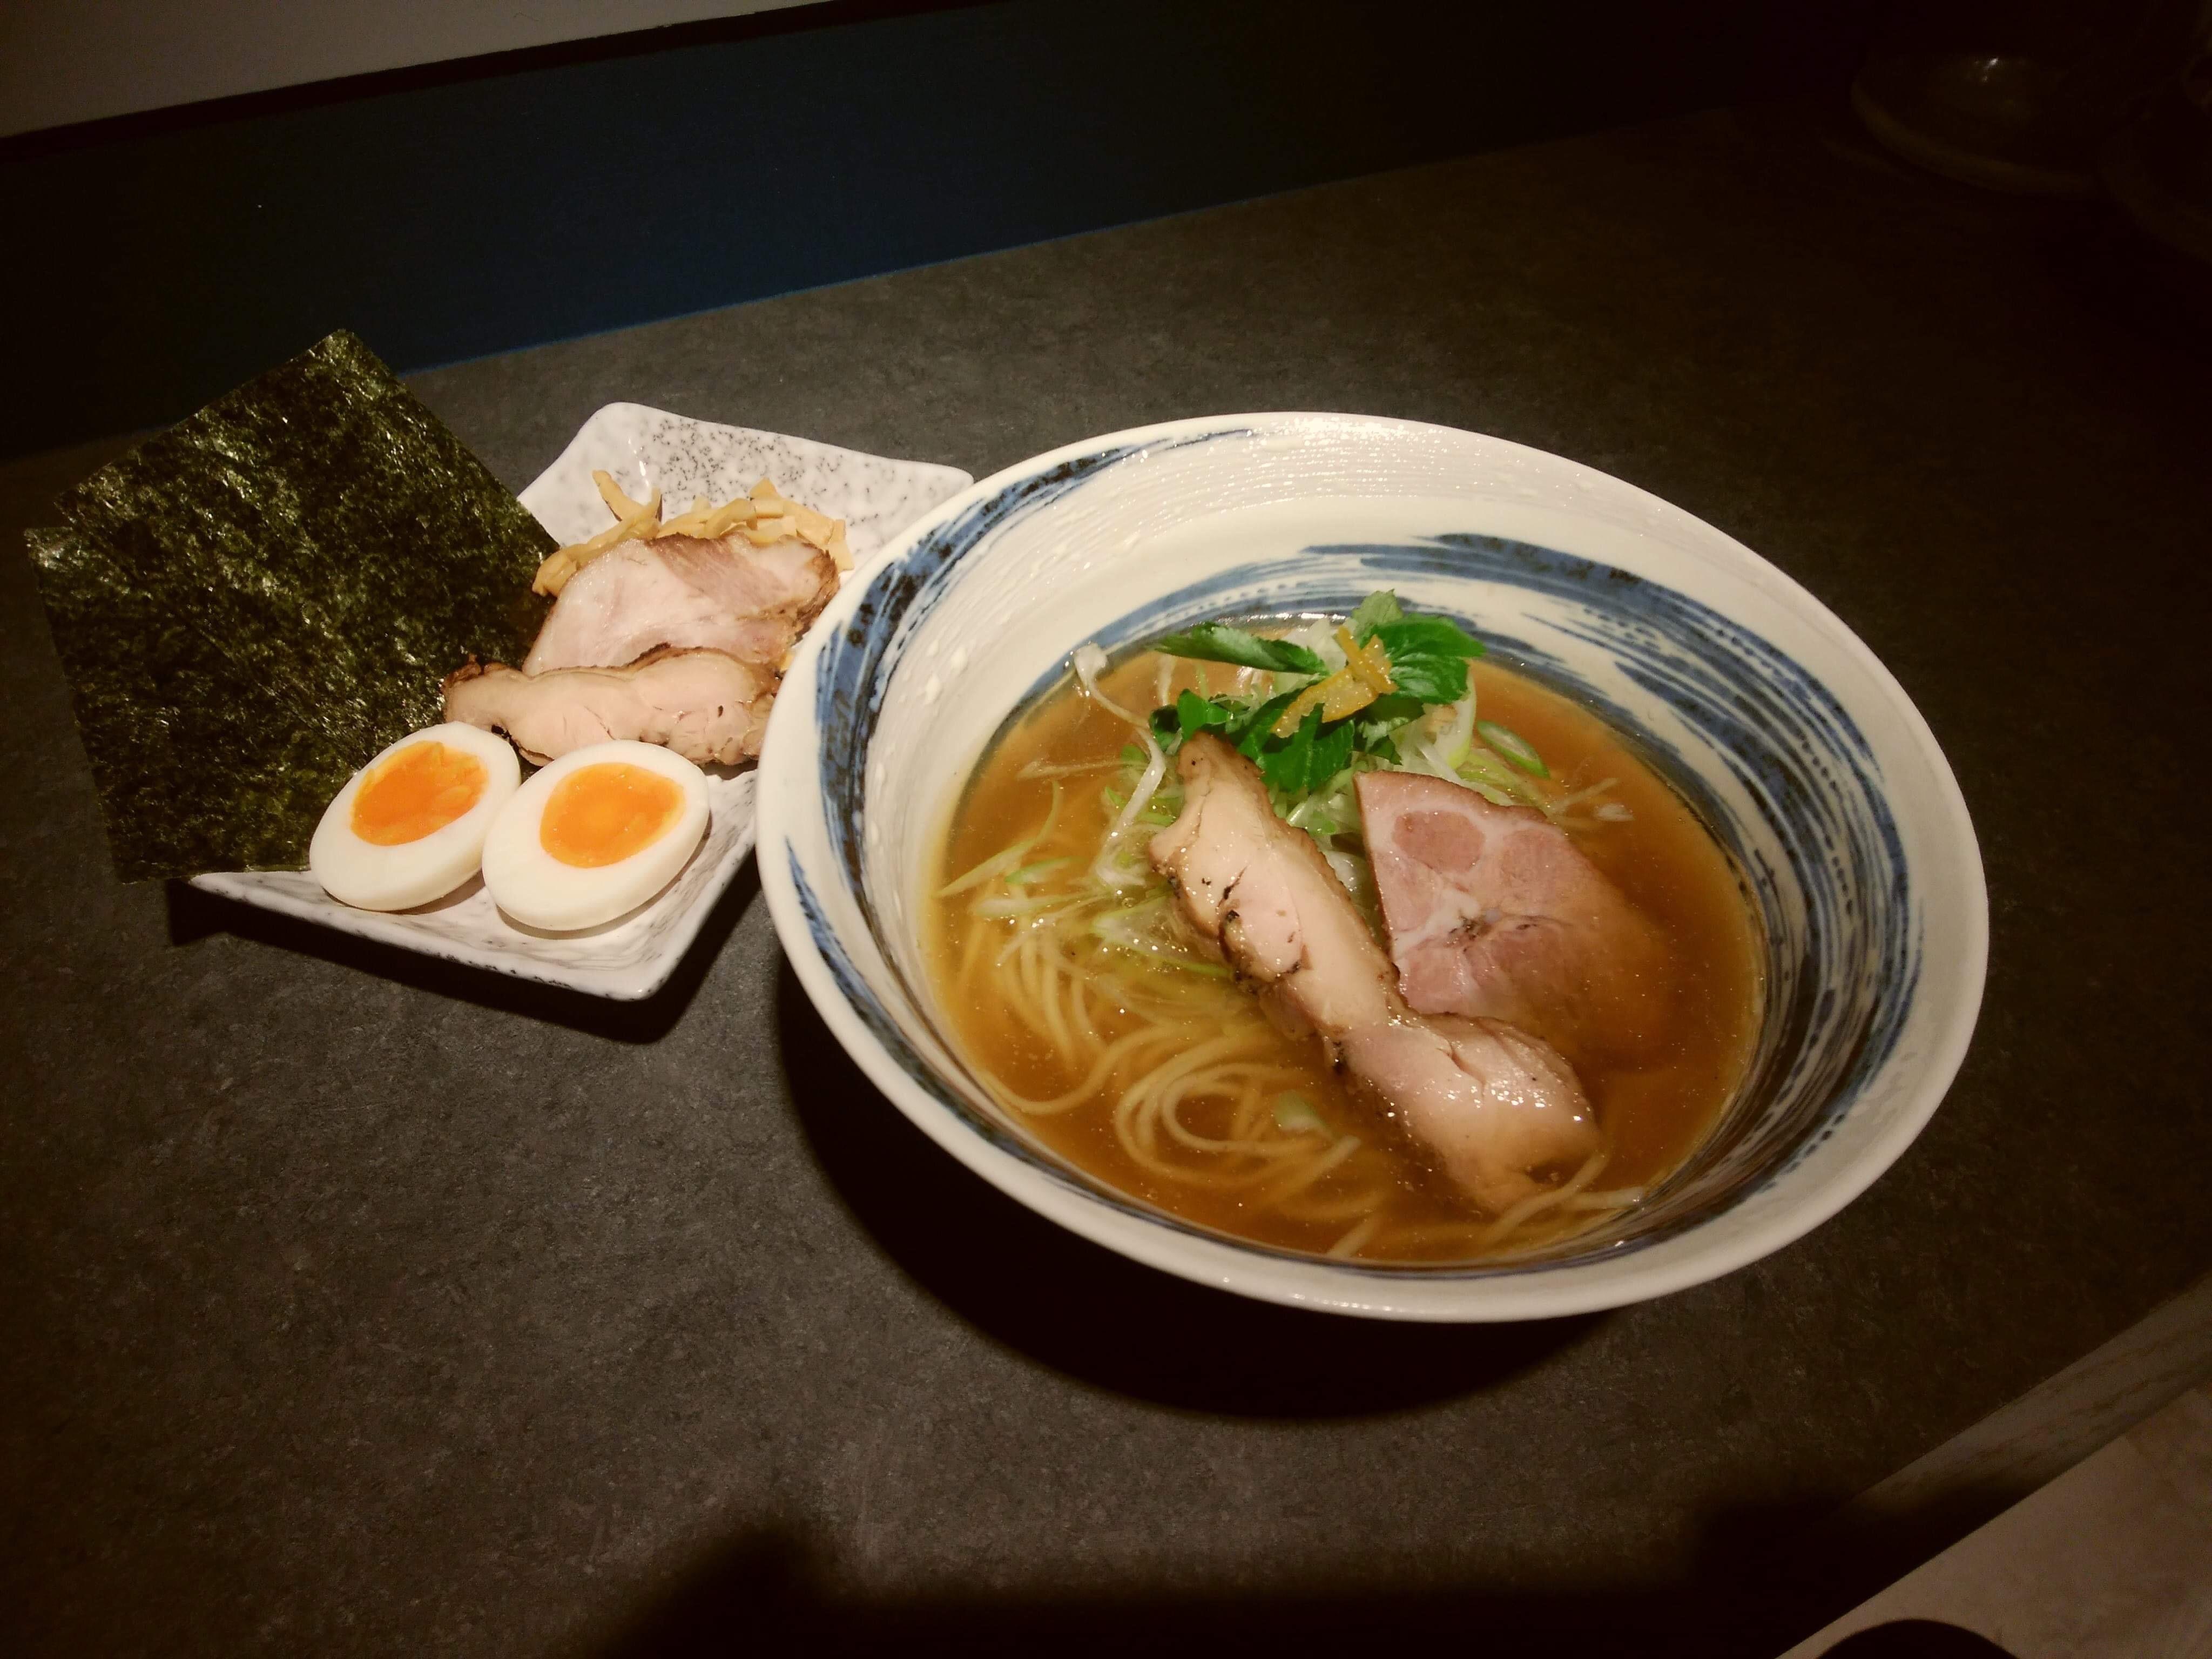 麺彩房弐NEXT 東京都中央区日本橋人形町2−6−12 特製焼き鰆そば